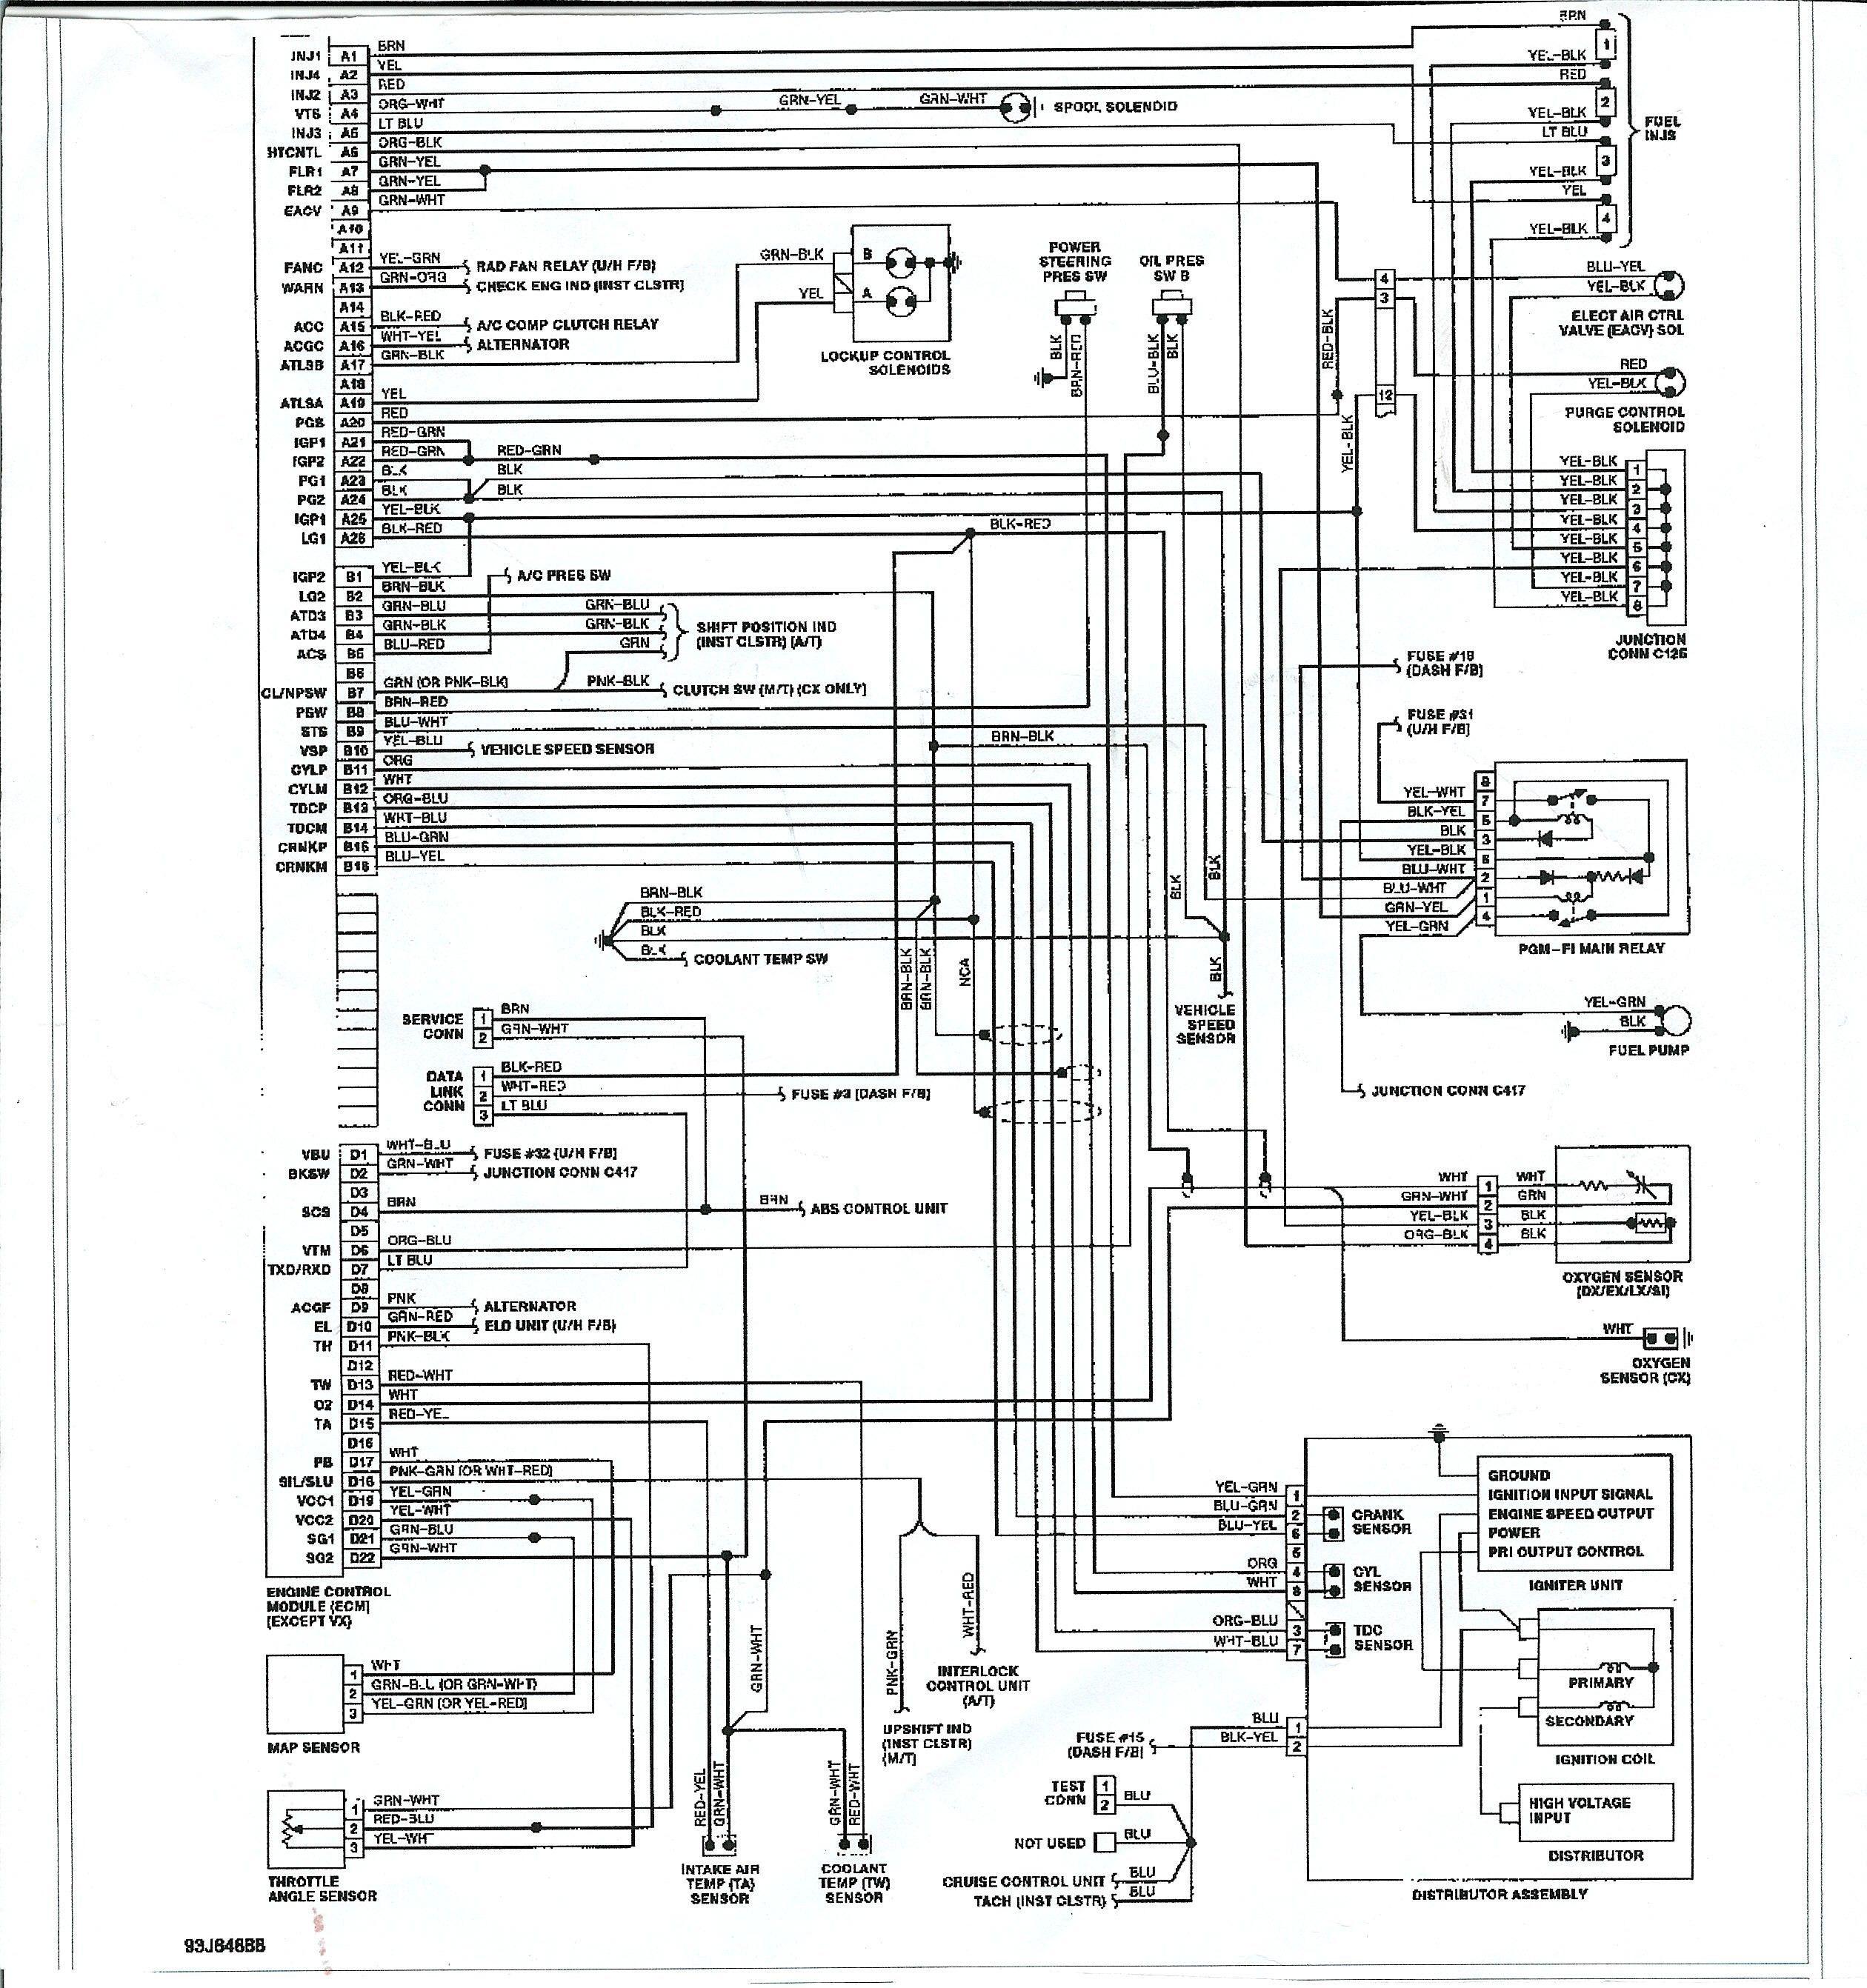 honda civik ek engine wiring diagram in 2021 | honda civic engine, honda  civic, honda accord  pinterest